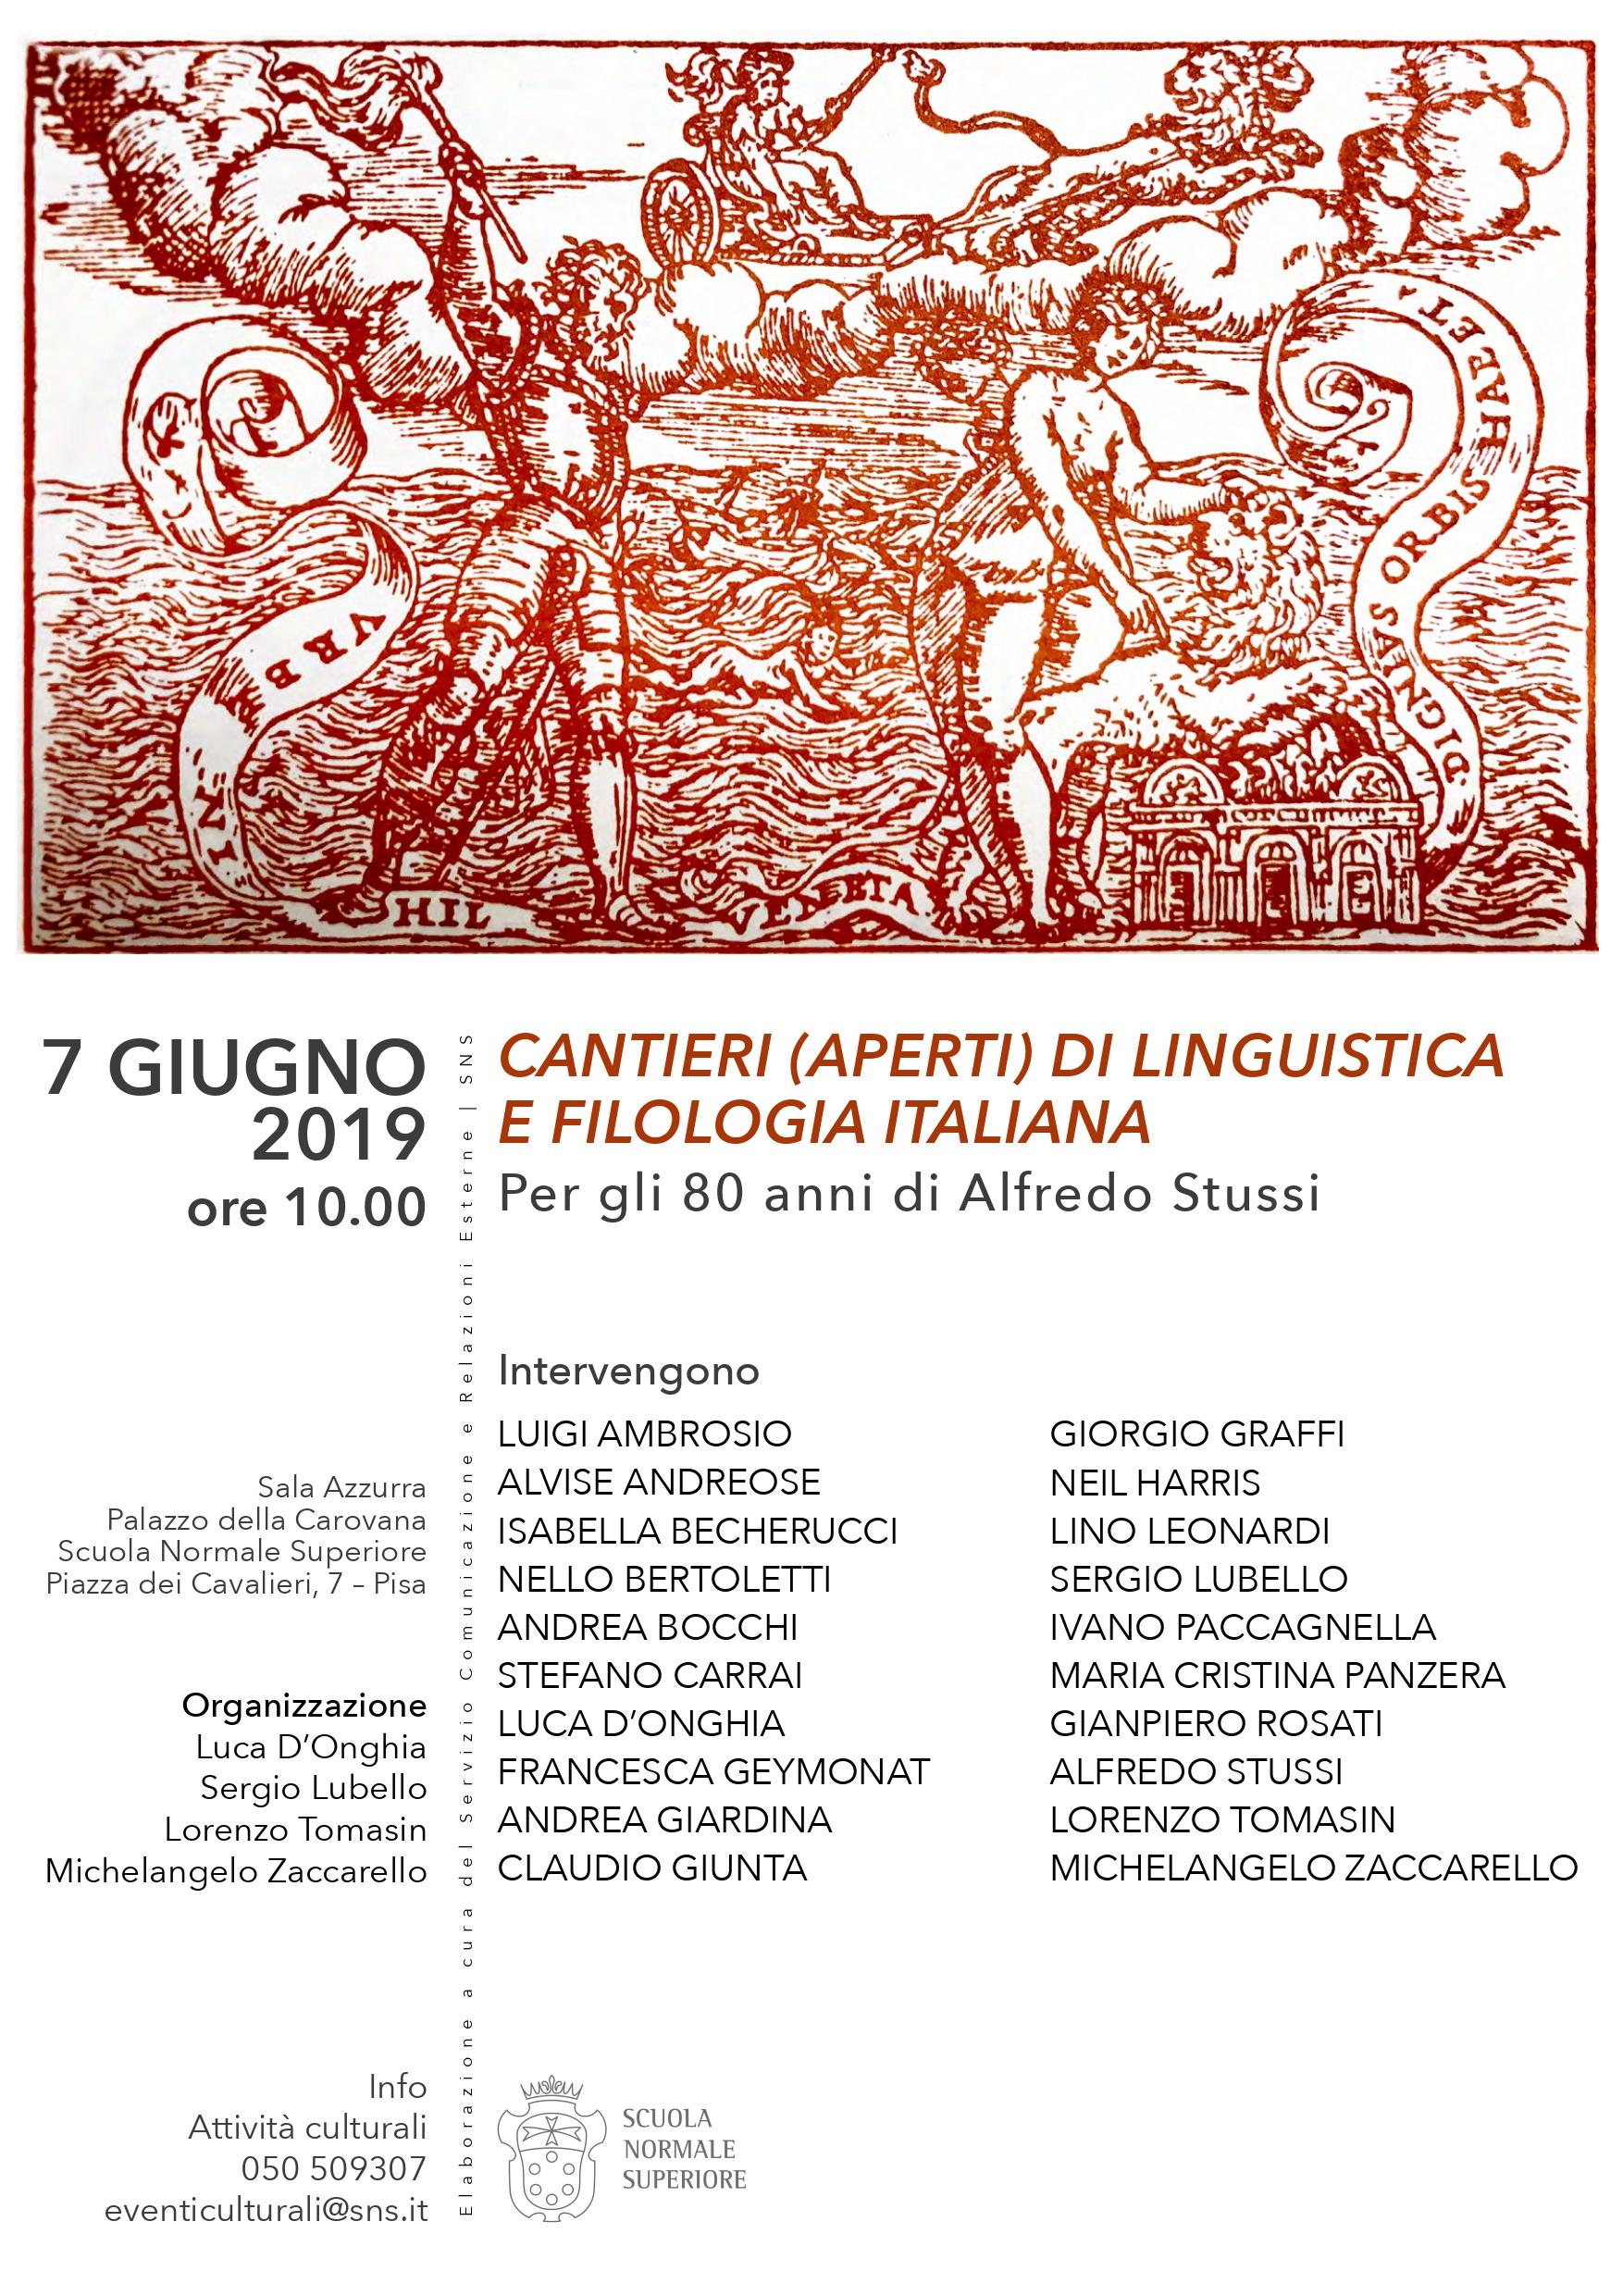 Stussi giornata 20190607 locandina WEB_page-0001